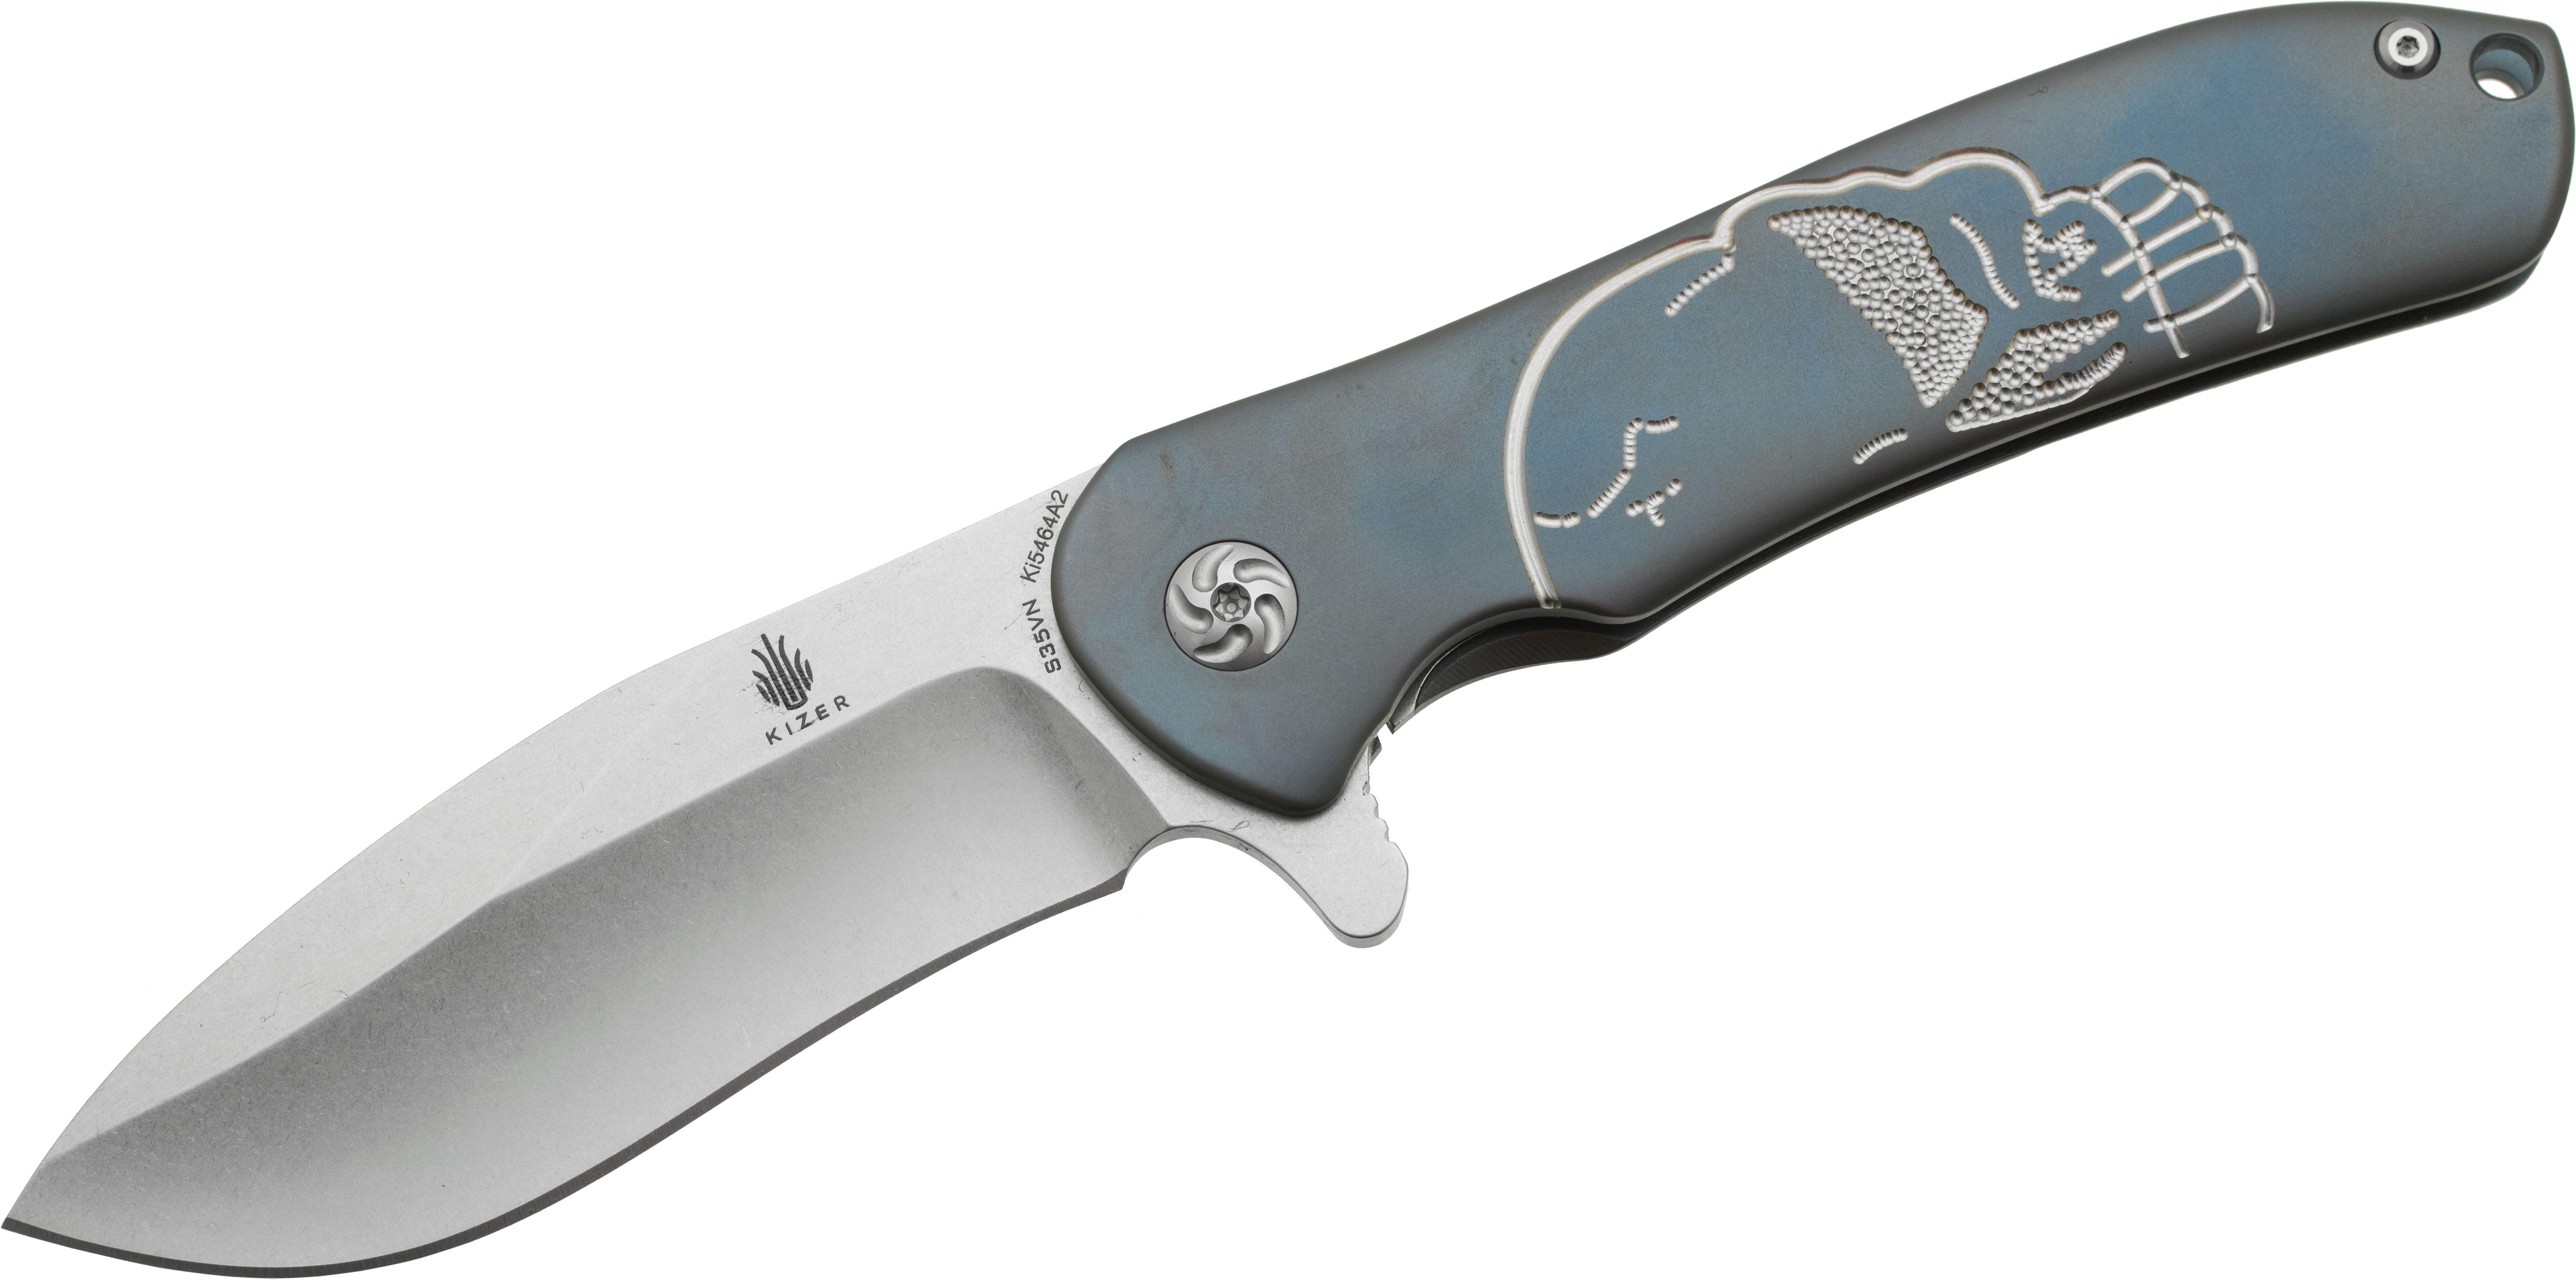 Kizer Cutlery Ki5464A2 Matt Cucchiara Hustler Skull Flipper 3.6 inch S35VN Stonewashed Blade, Blue Engraved Titanium Handles